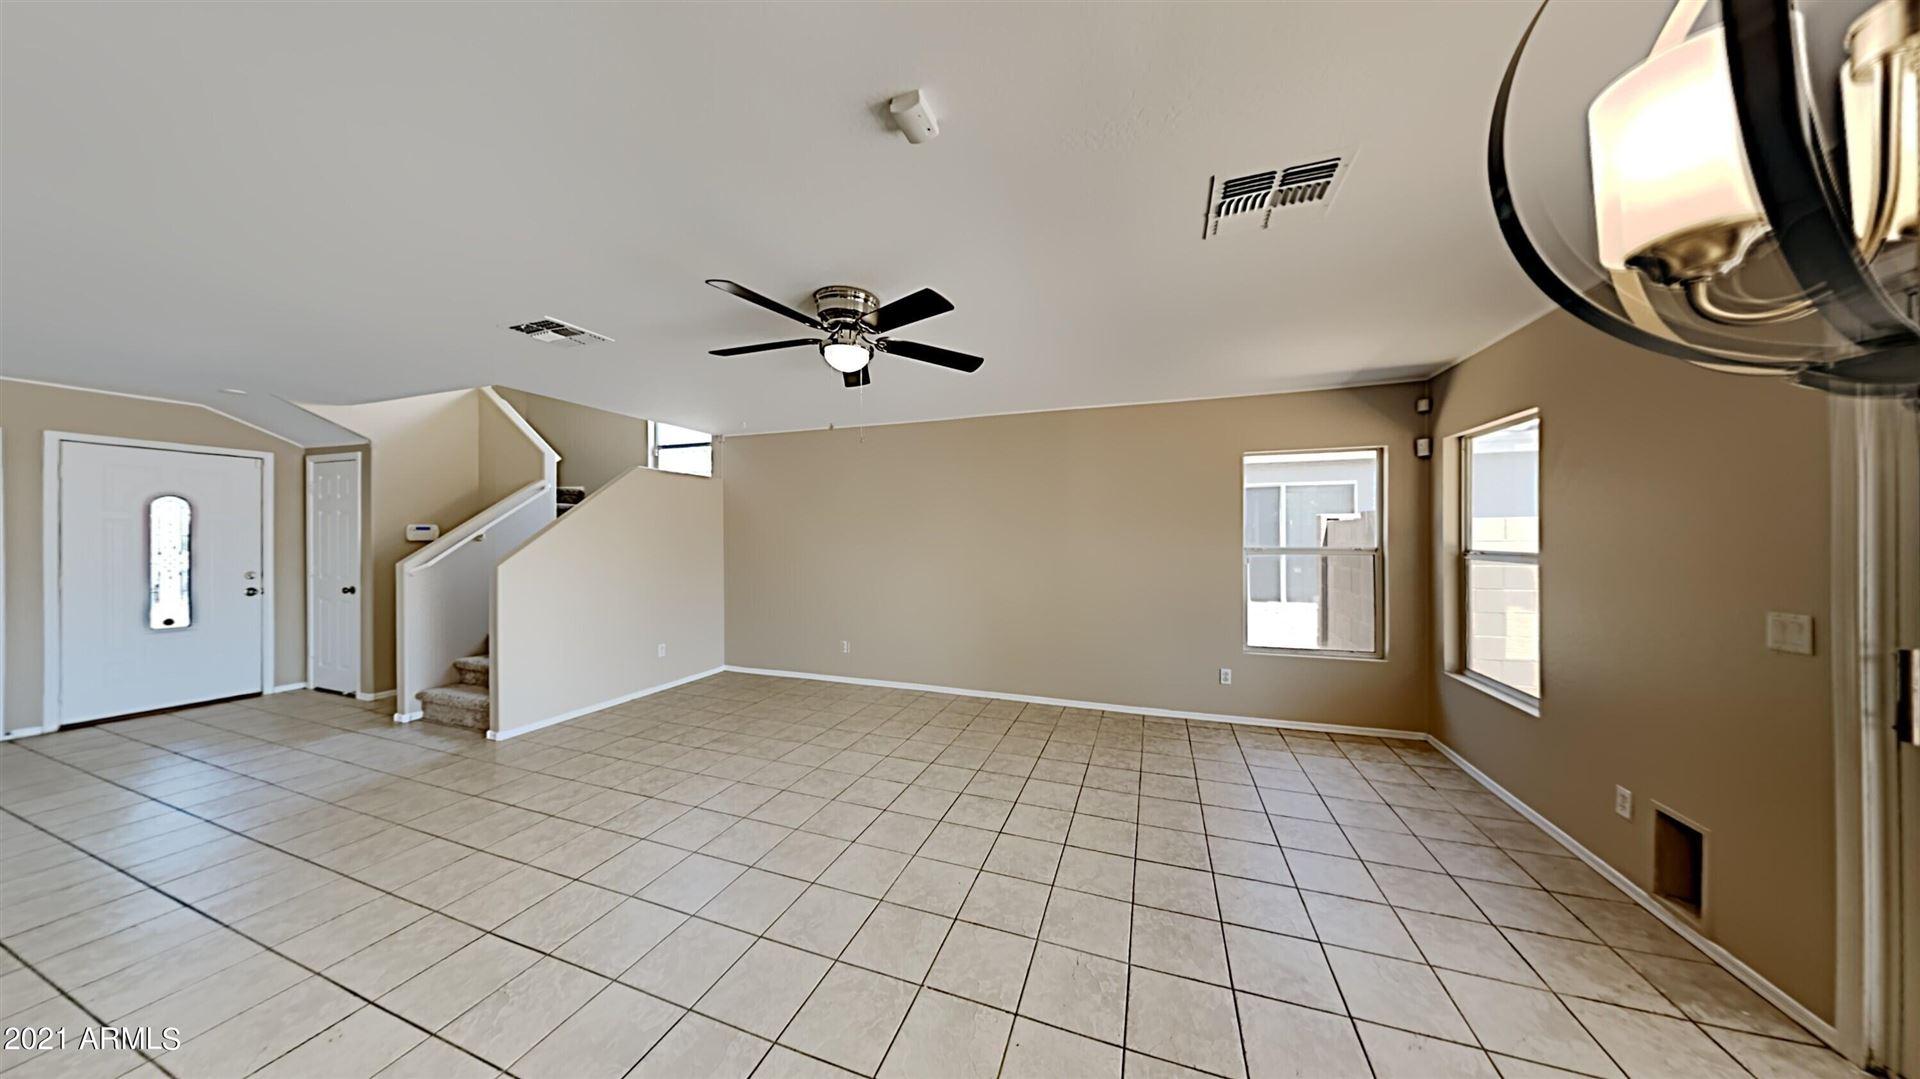 Photo of 11825 W POINSETTIA Drive, El Mirage, AZ 85335 (MLS # 6247195)